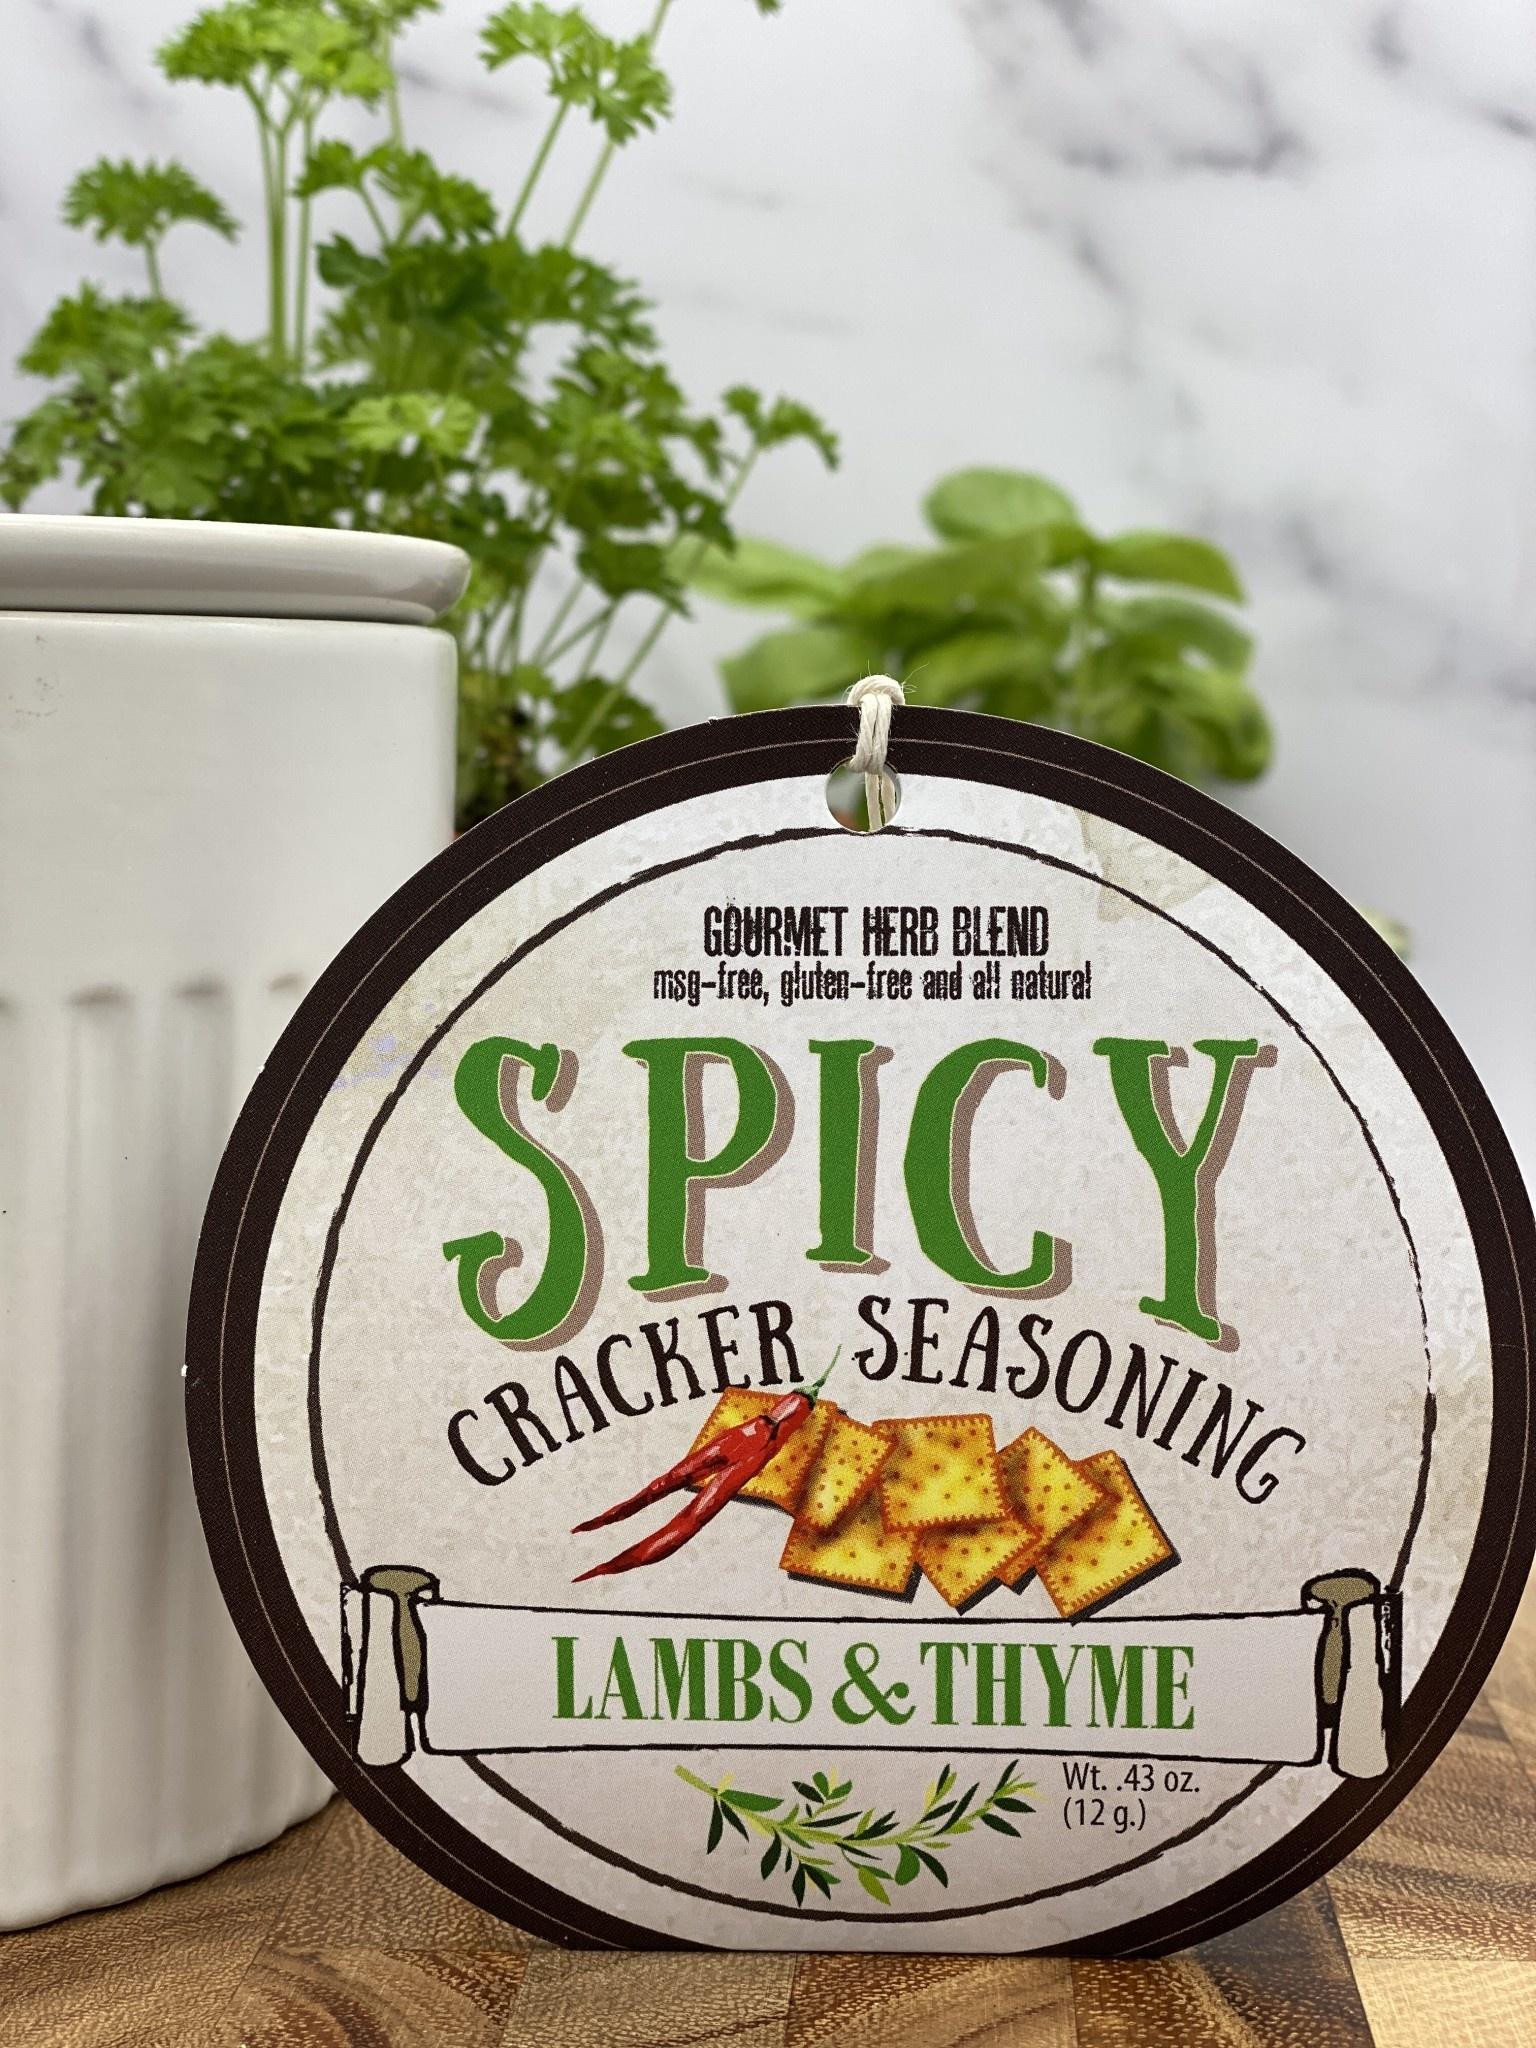 Lambs & Thyme Spicy Cracker Seasoning